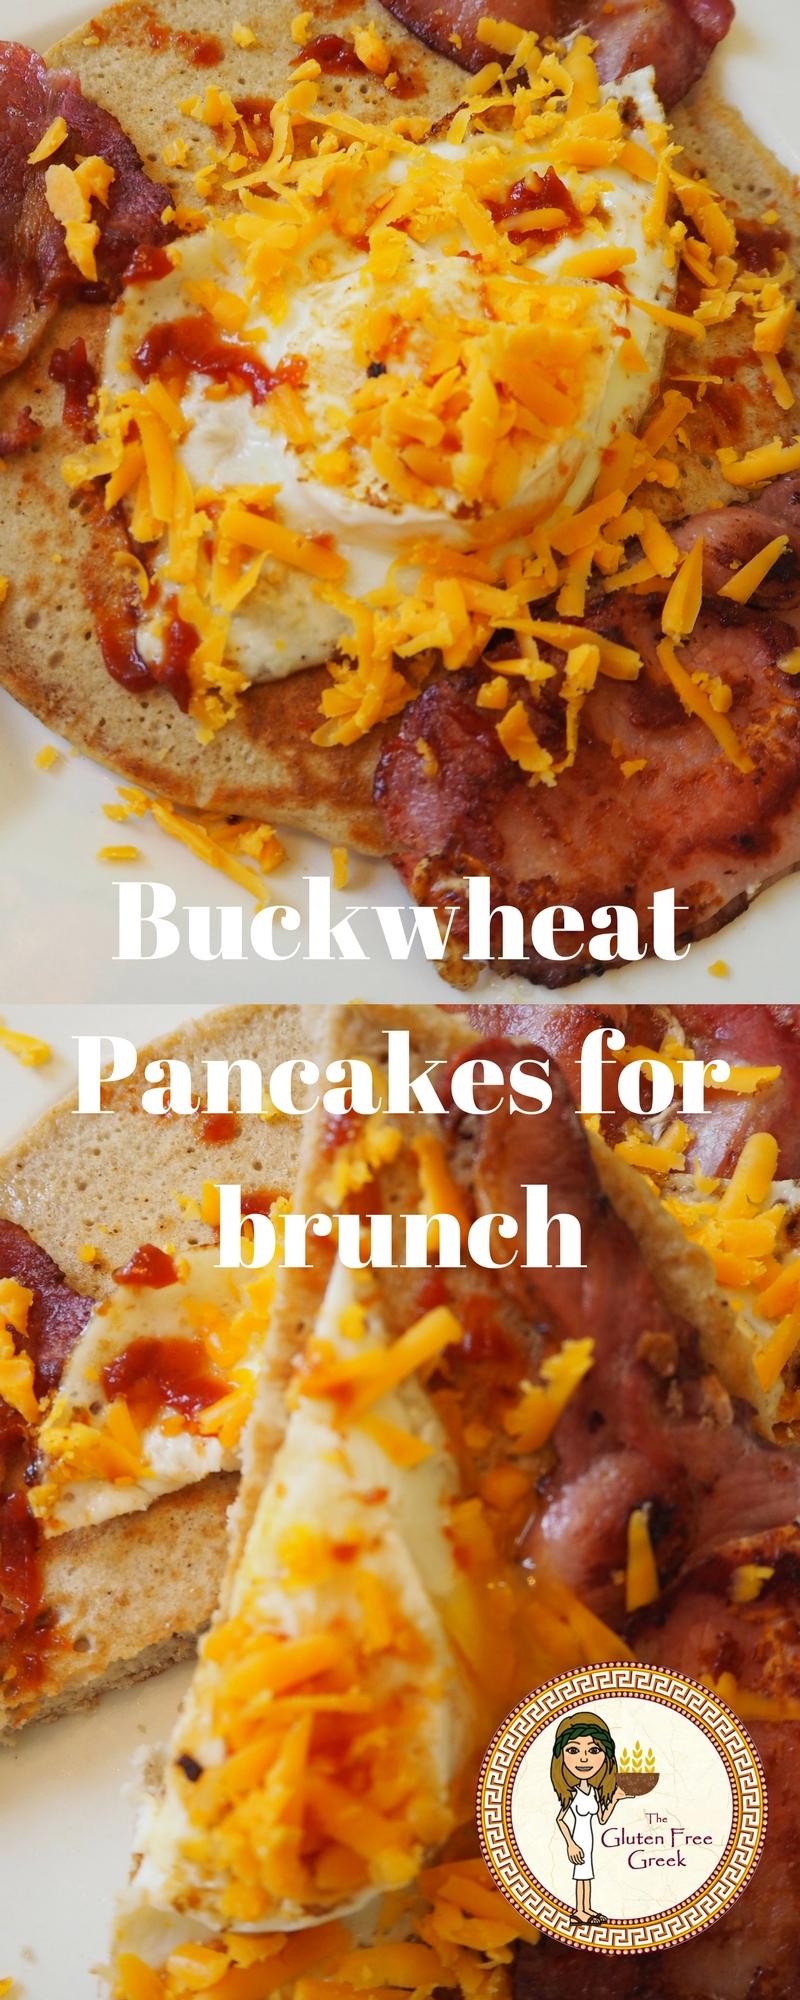 buckwheat pancakes for brunch